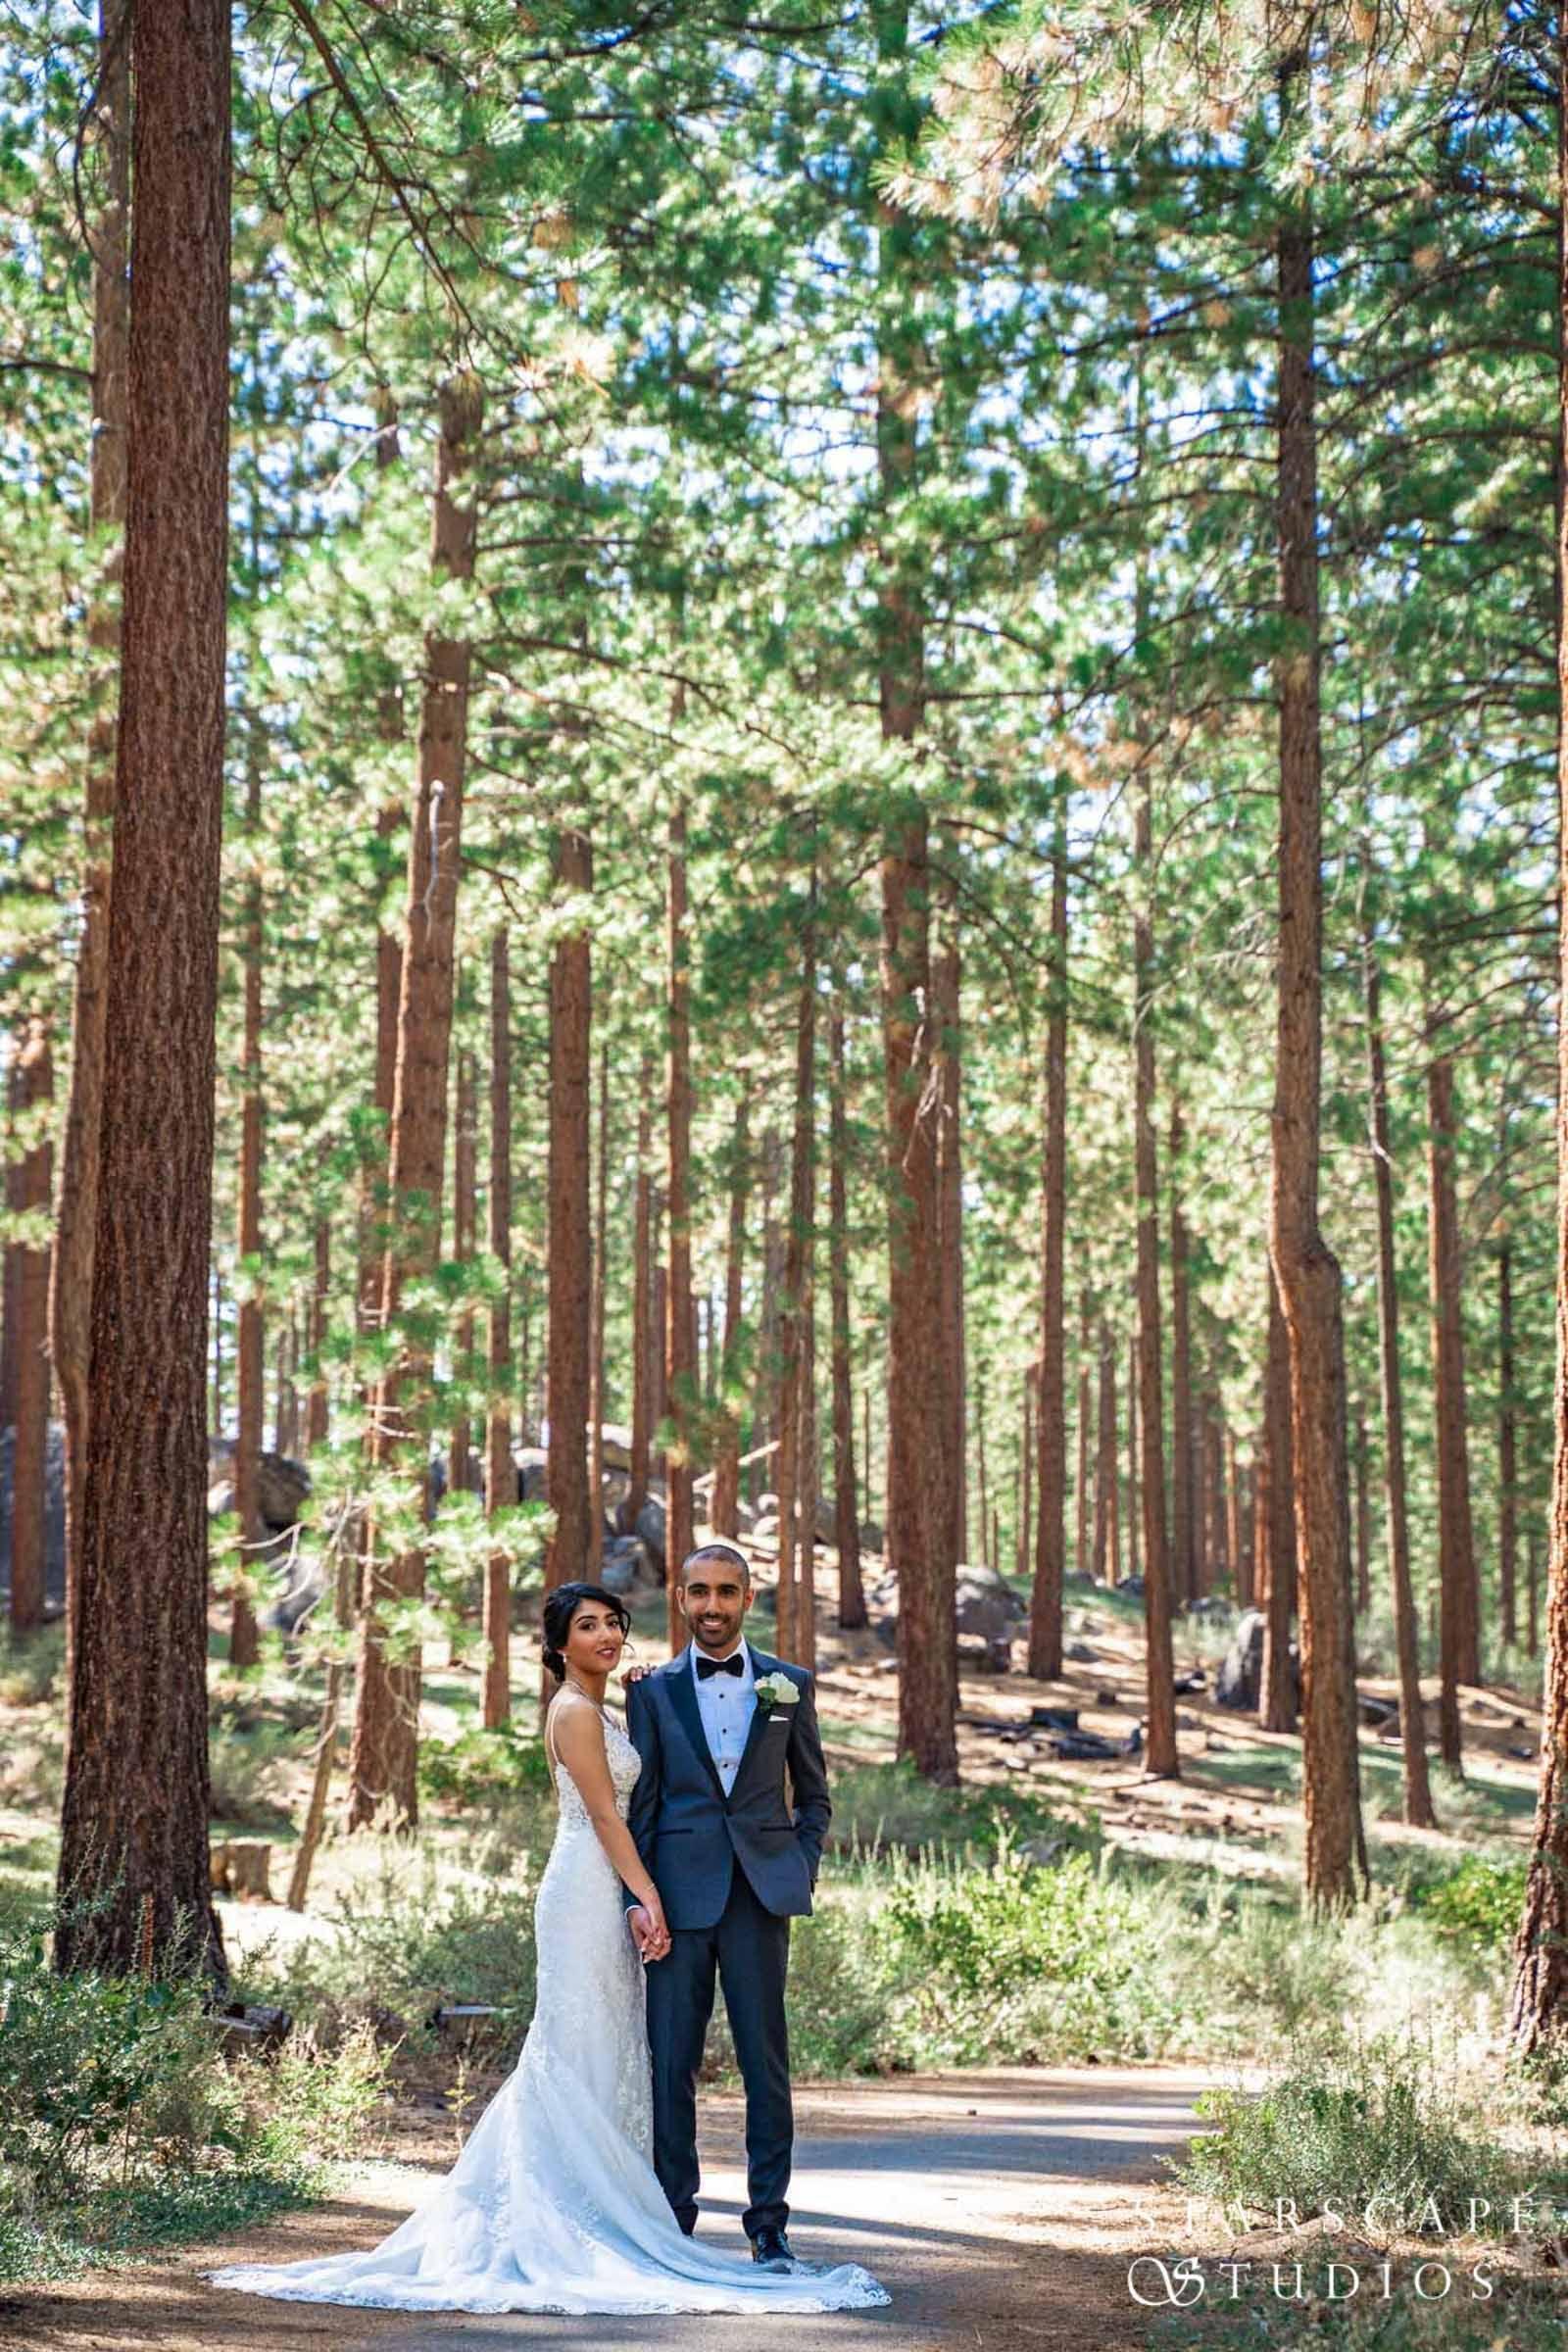 Regan Beach Wedding Lake Tahoe Photographer Starscape Studios In 2020 California Beach Wedding Tahoe Wedding Venue South Lake Tahoe Weddings